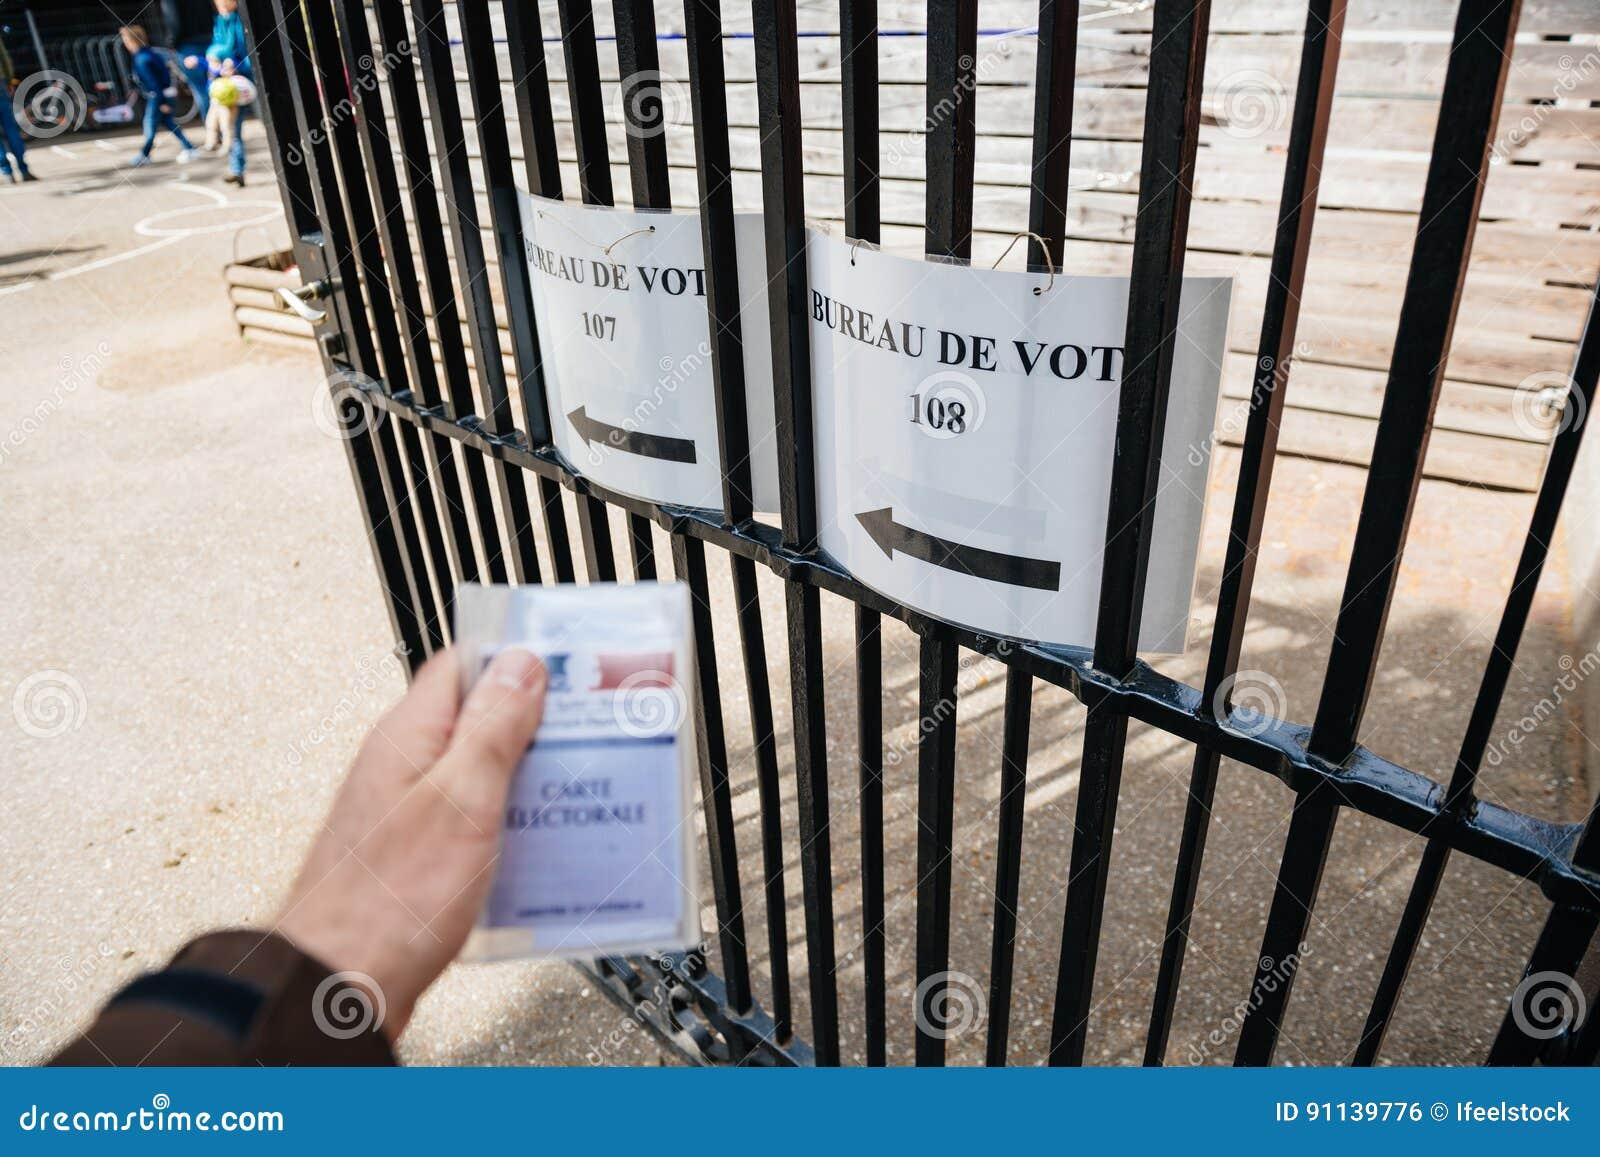 Bureau de vote personal perspective pov editorial photo image of